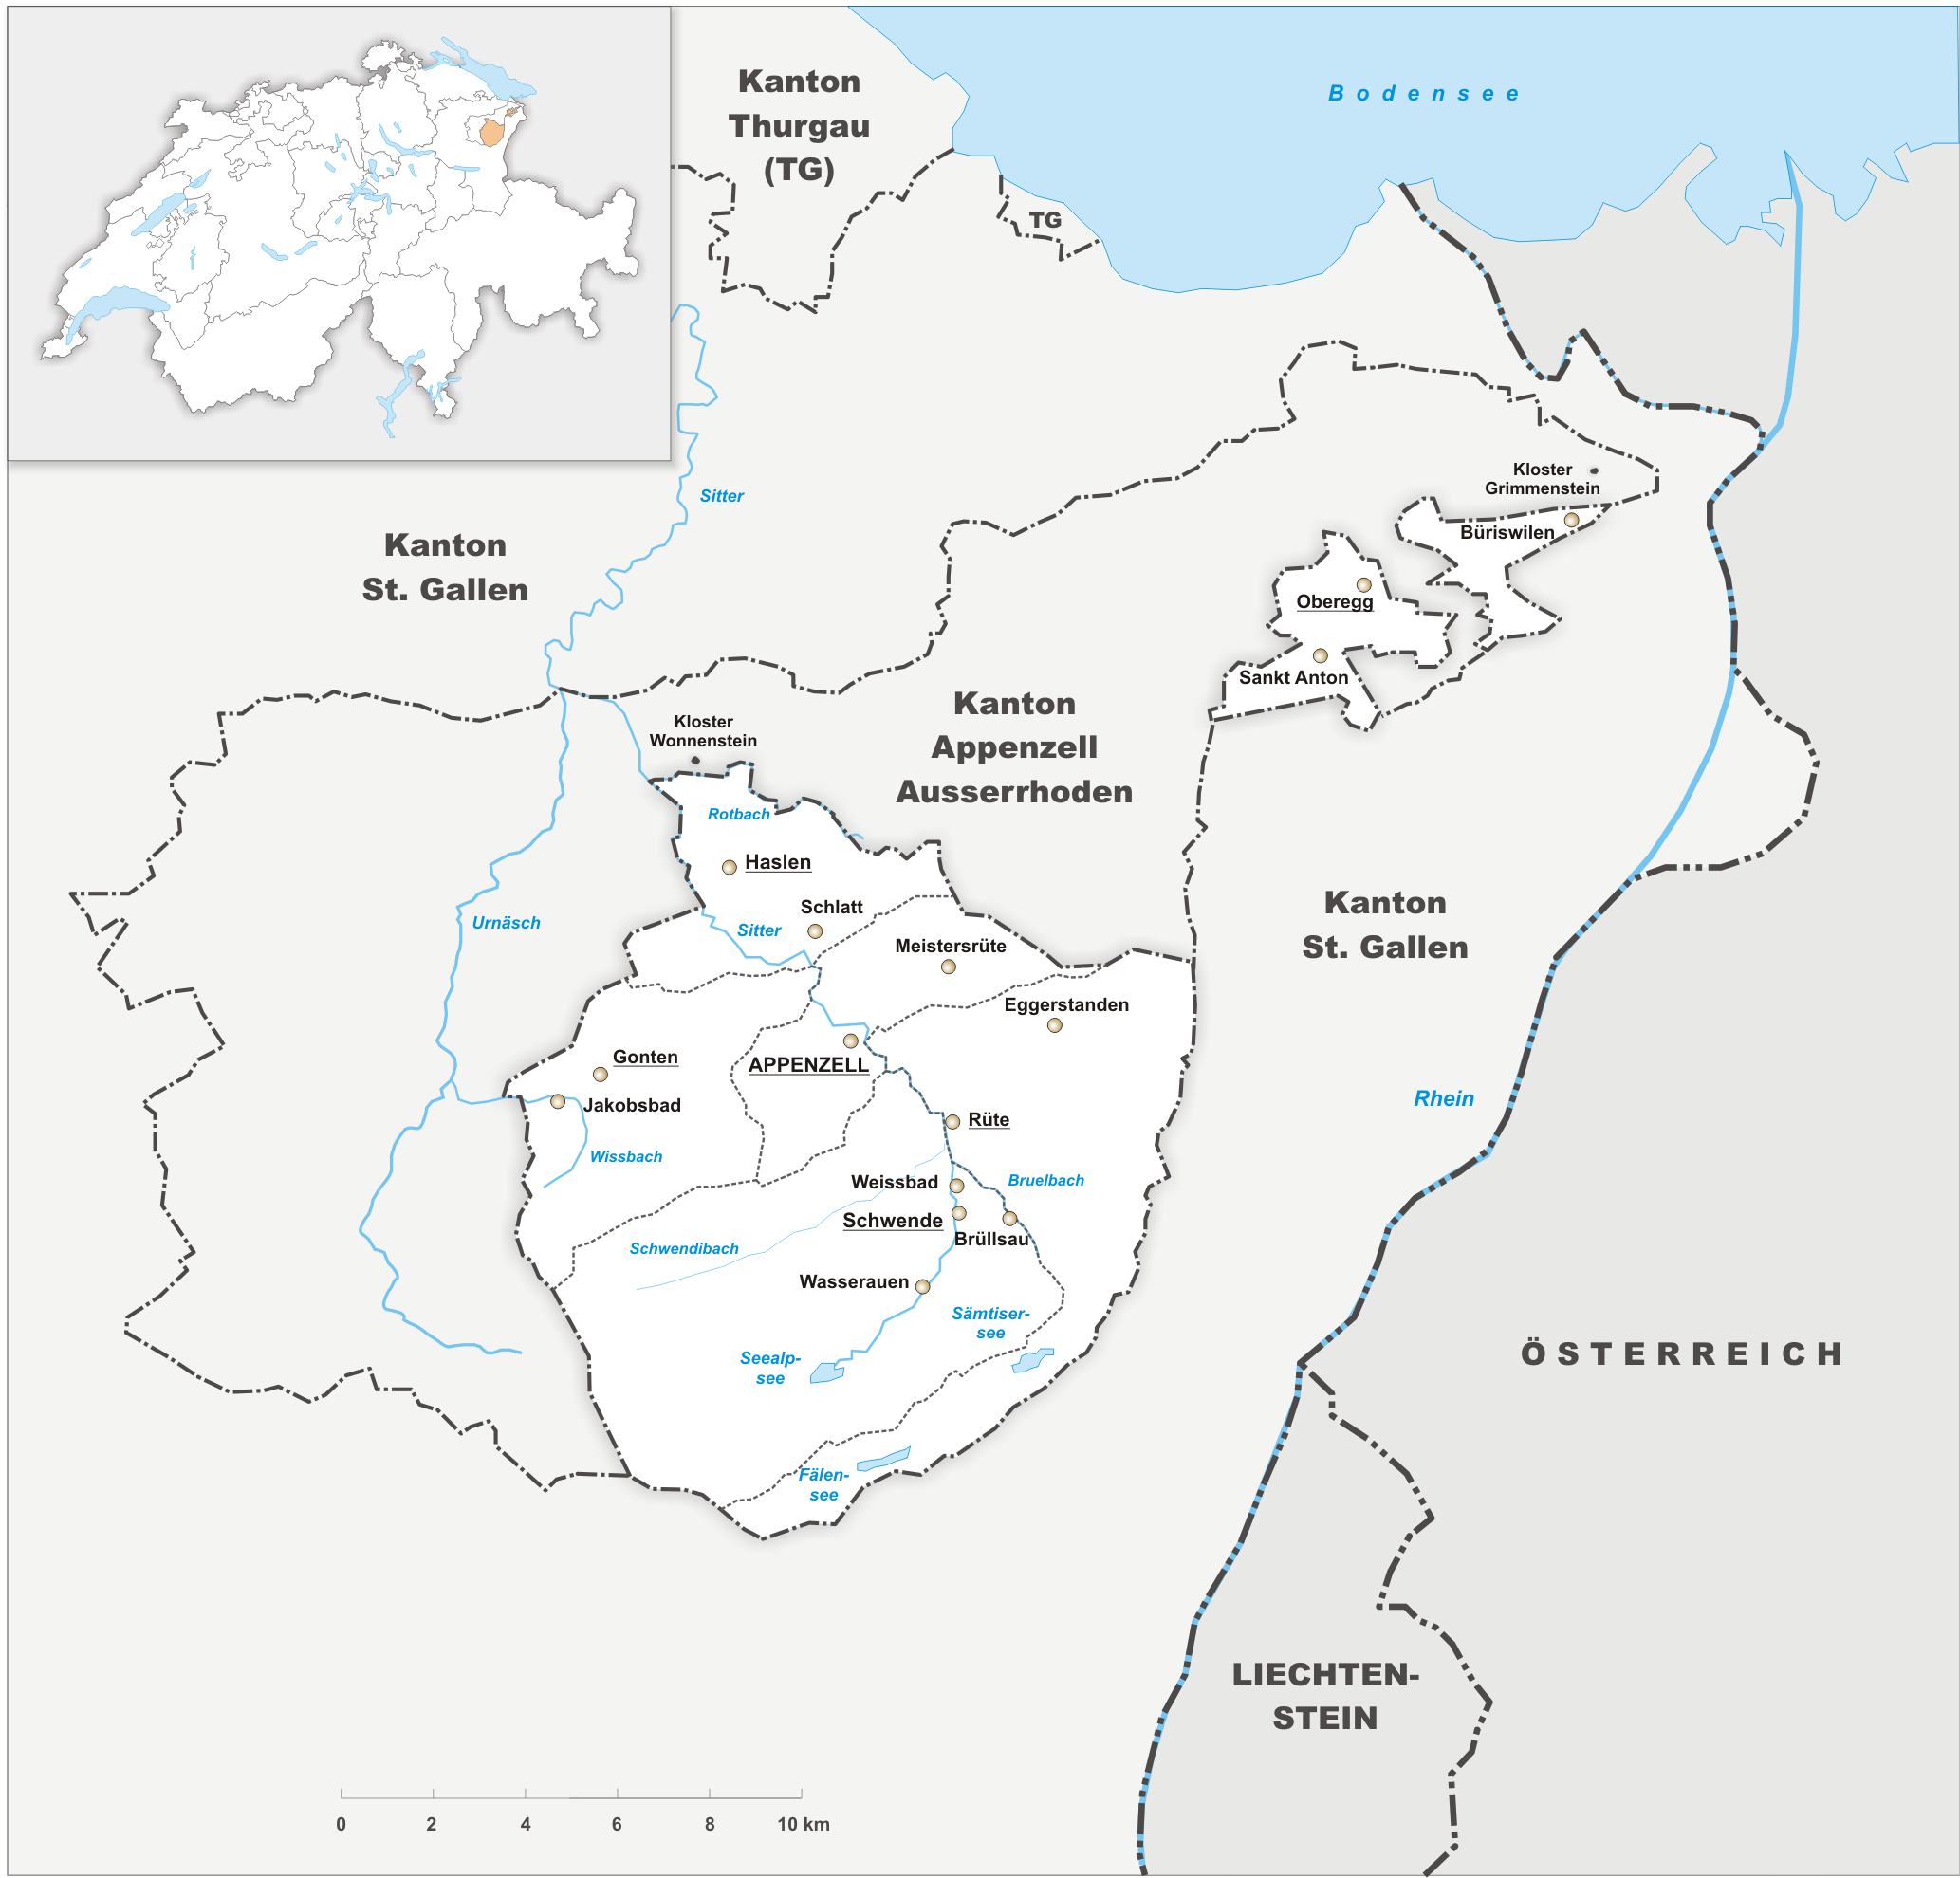 FileKarte Kanton Appenzell Innerrhoden 2010png Wikimedia Commons